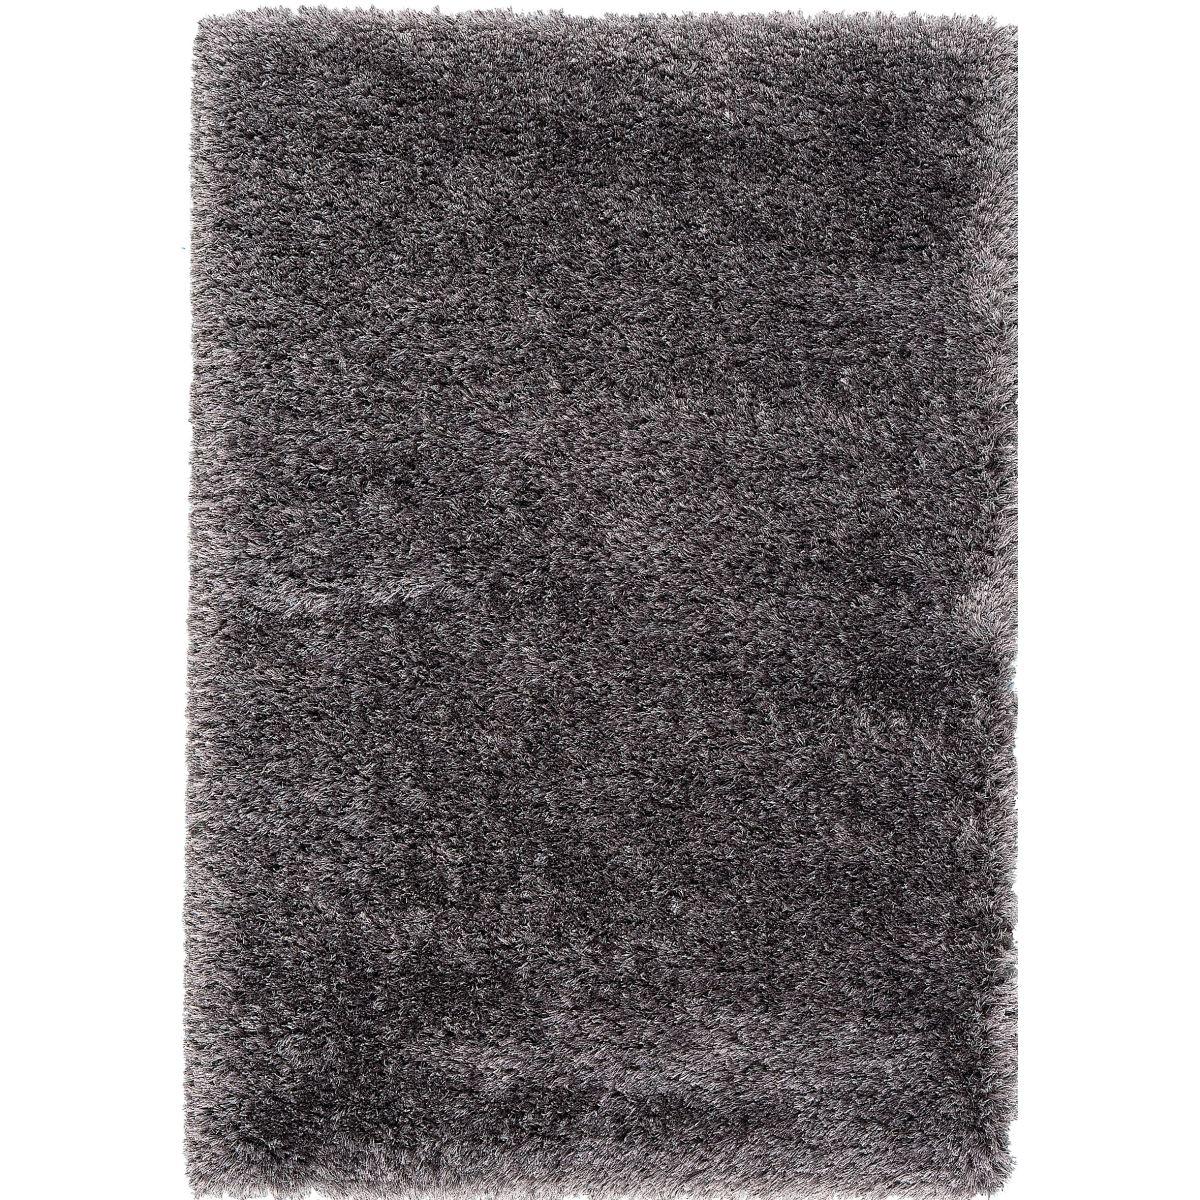 berber webteppich rhapsody grau 160x160 porta. Black Bedroom Furniture Sets. Home Design Ideas